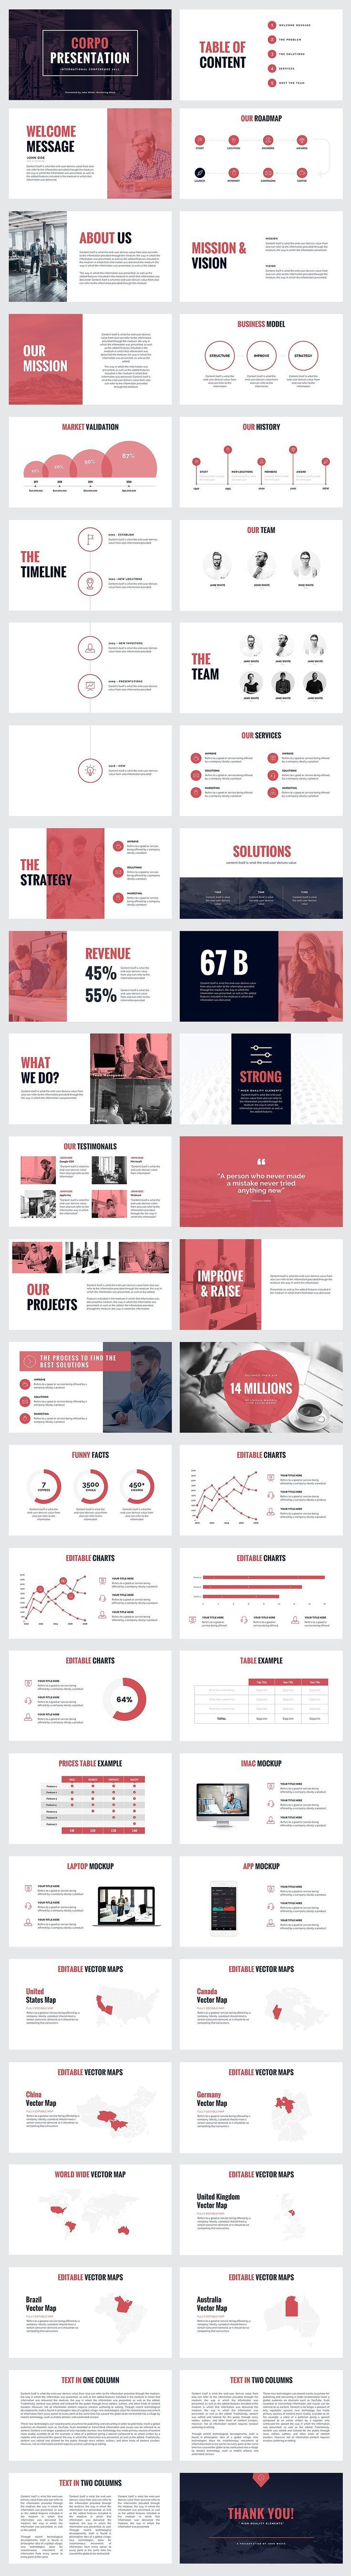 Business Powerpoint Template Presentation Publications